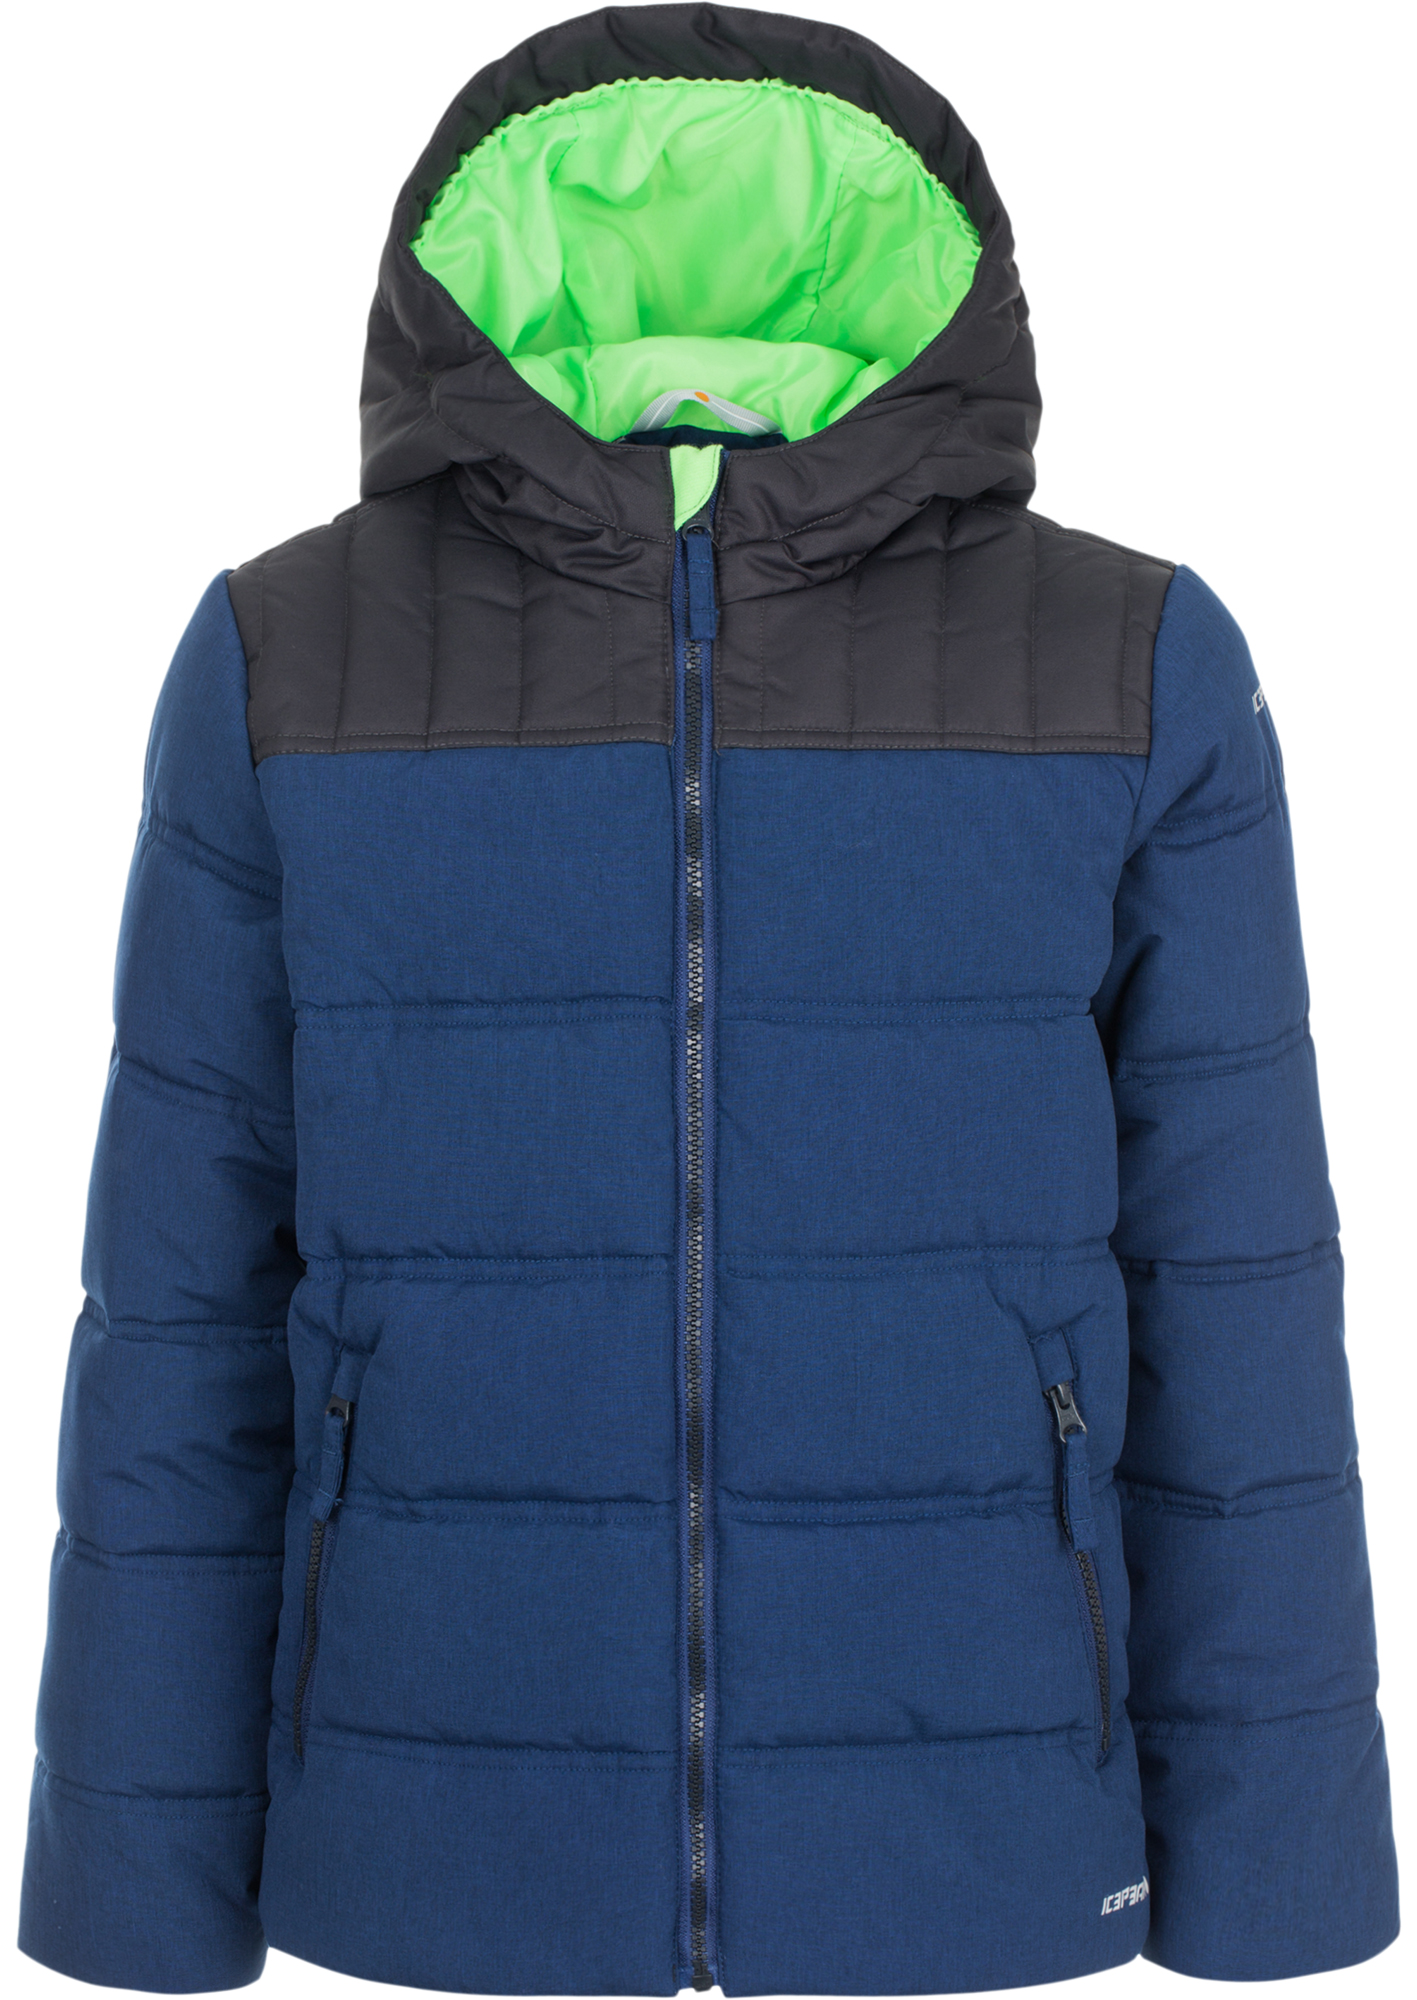 IcePeak Куртка утепленная для мальчиков  Rimo, размер 176